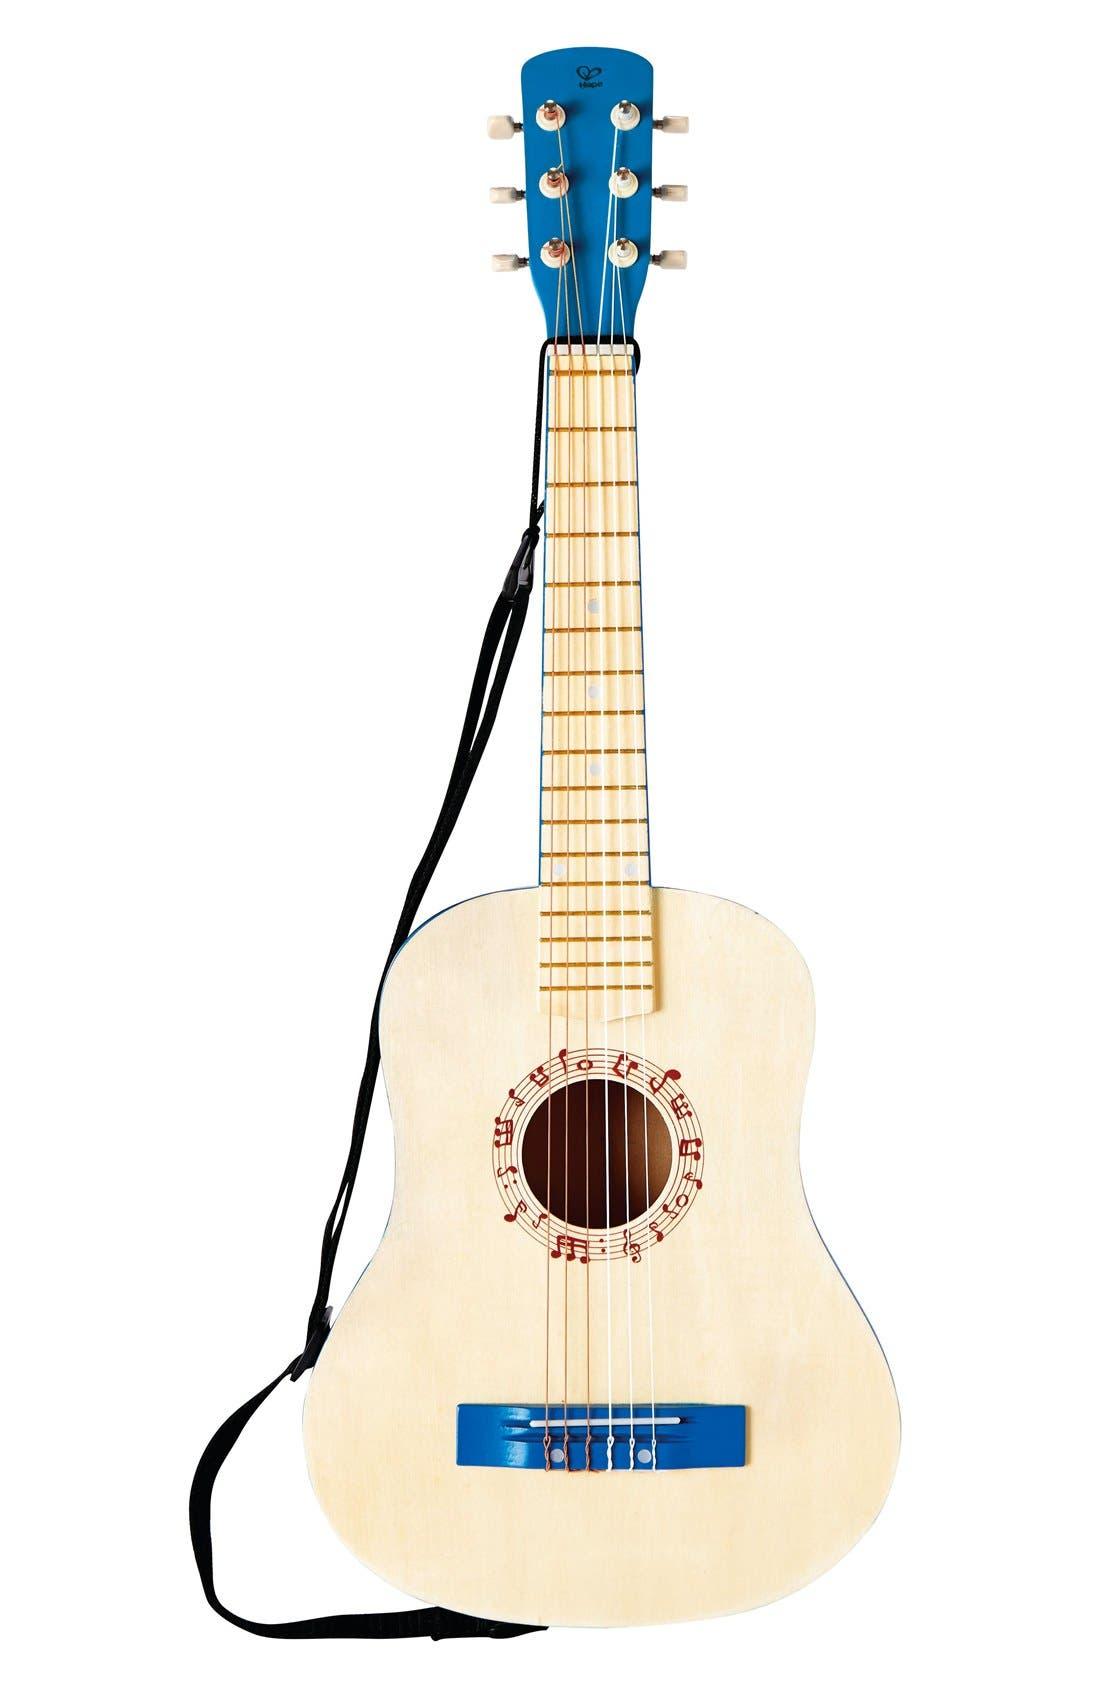 Hape 'Vibrant' Guitar